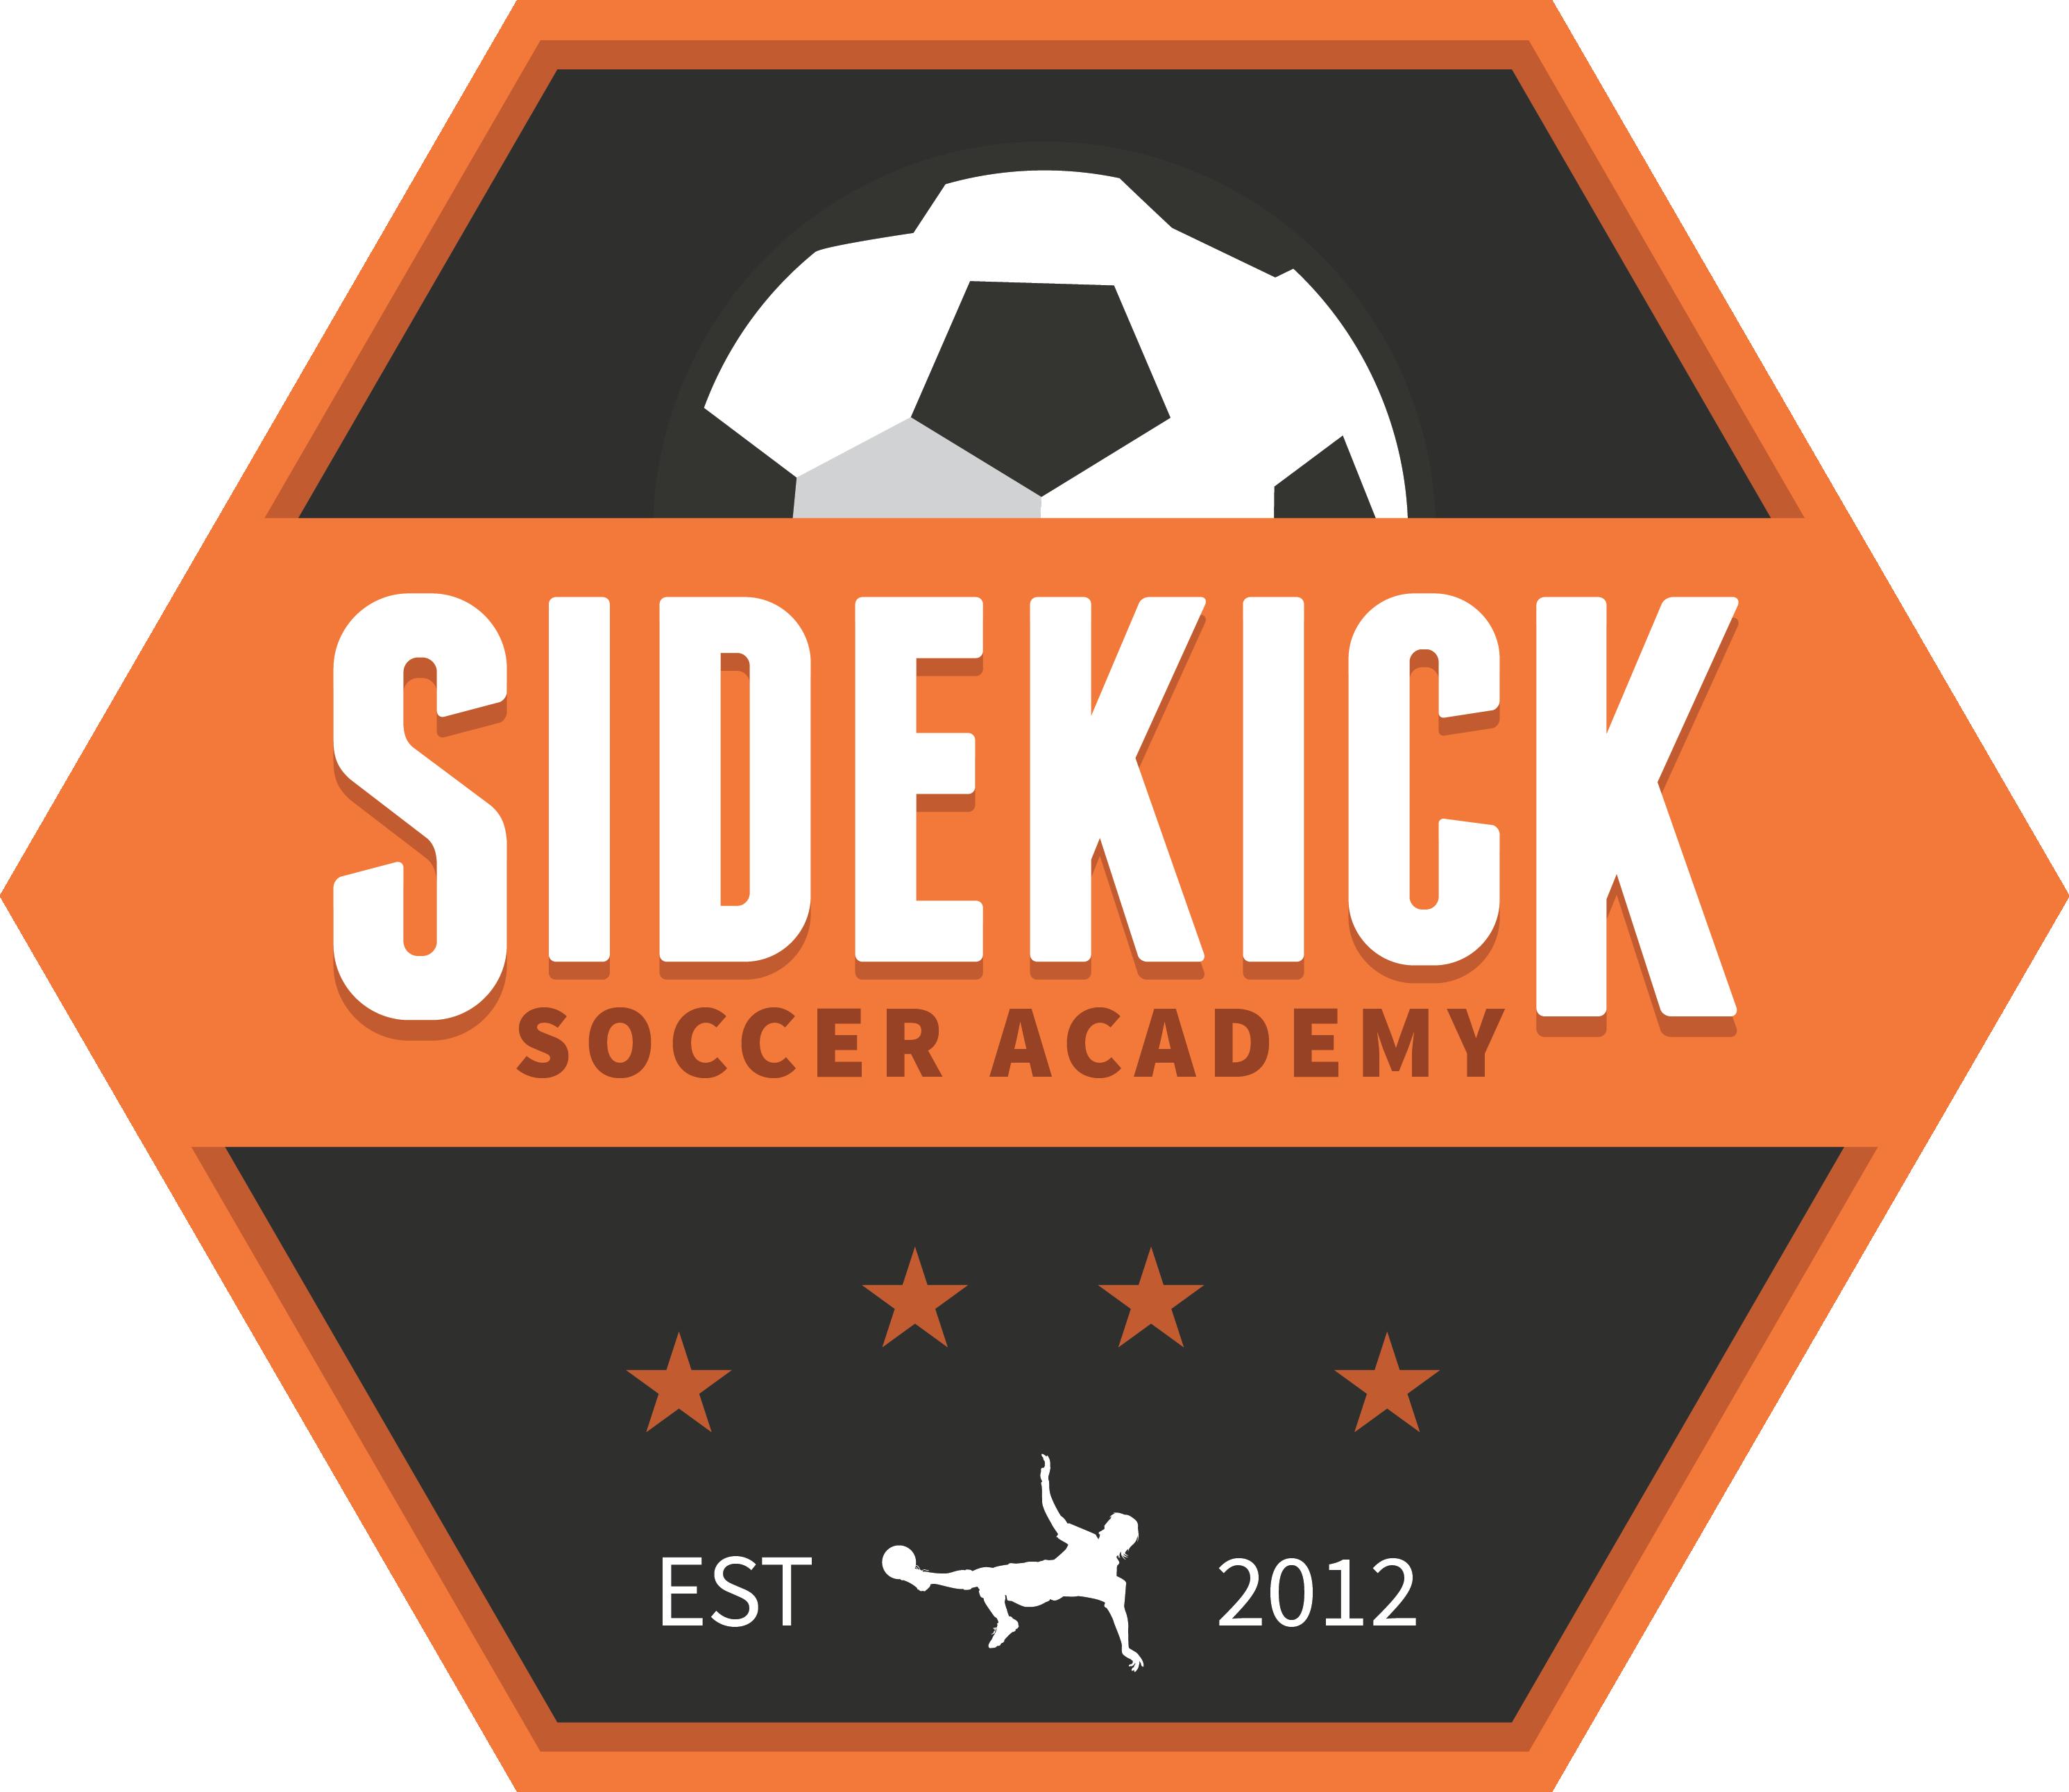 Sidekick-FullColor